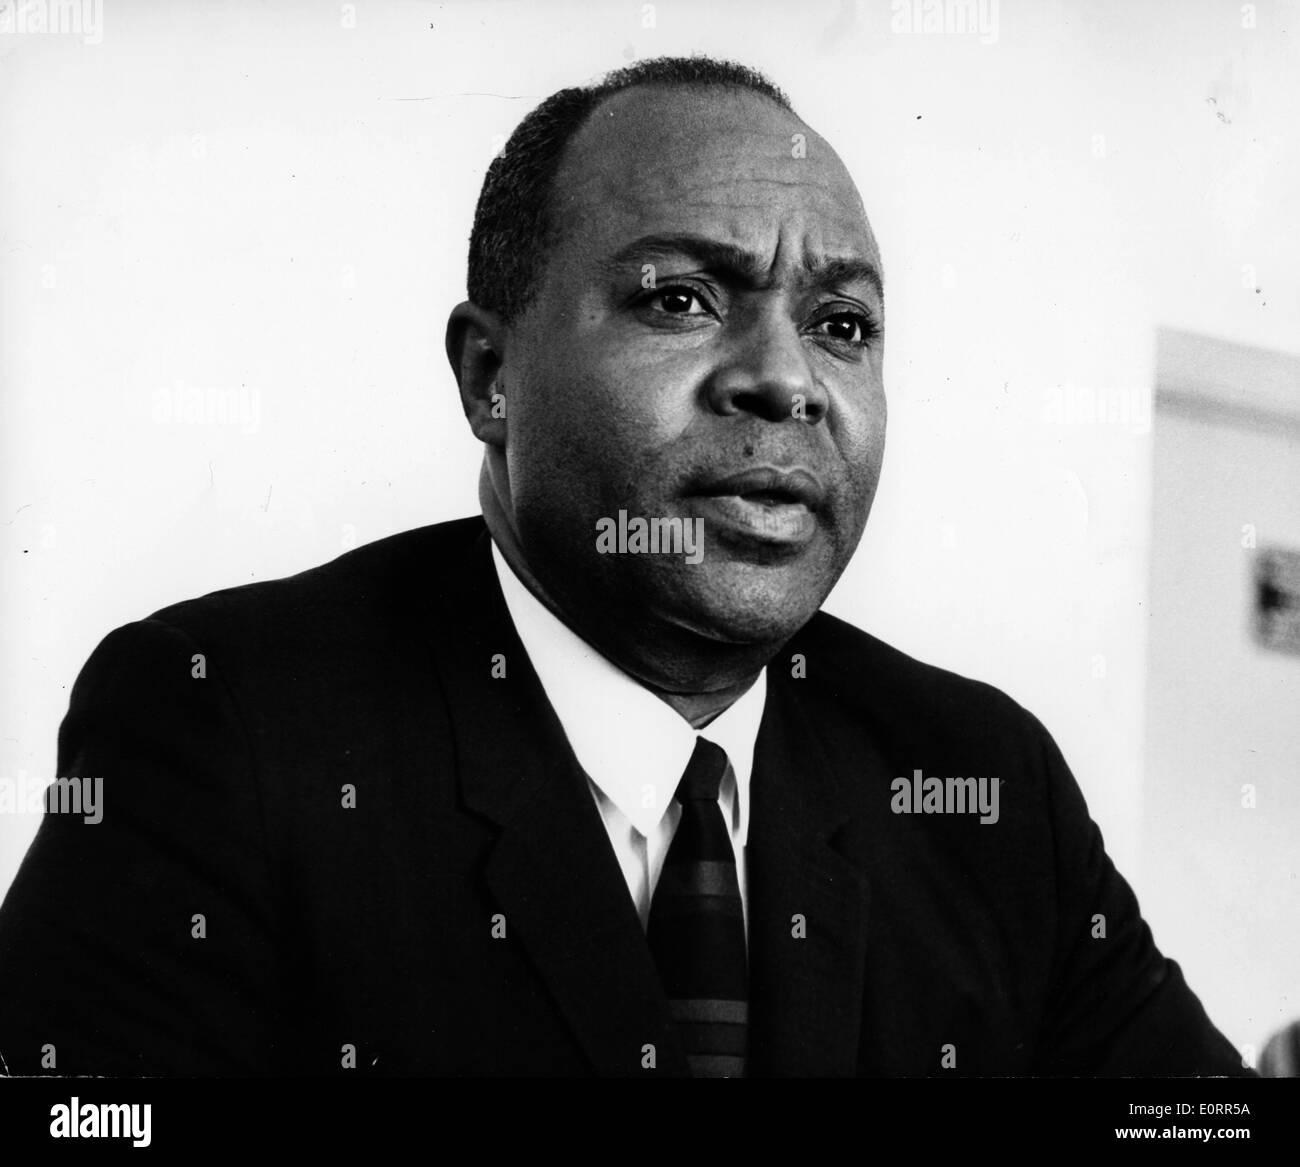 Civil Rights Leader James L Farmer Jr In Meeting Stock Photo Alamy